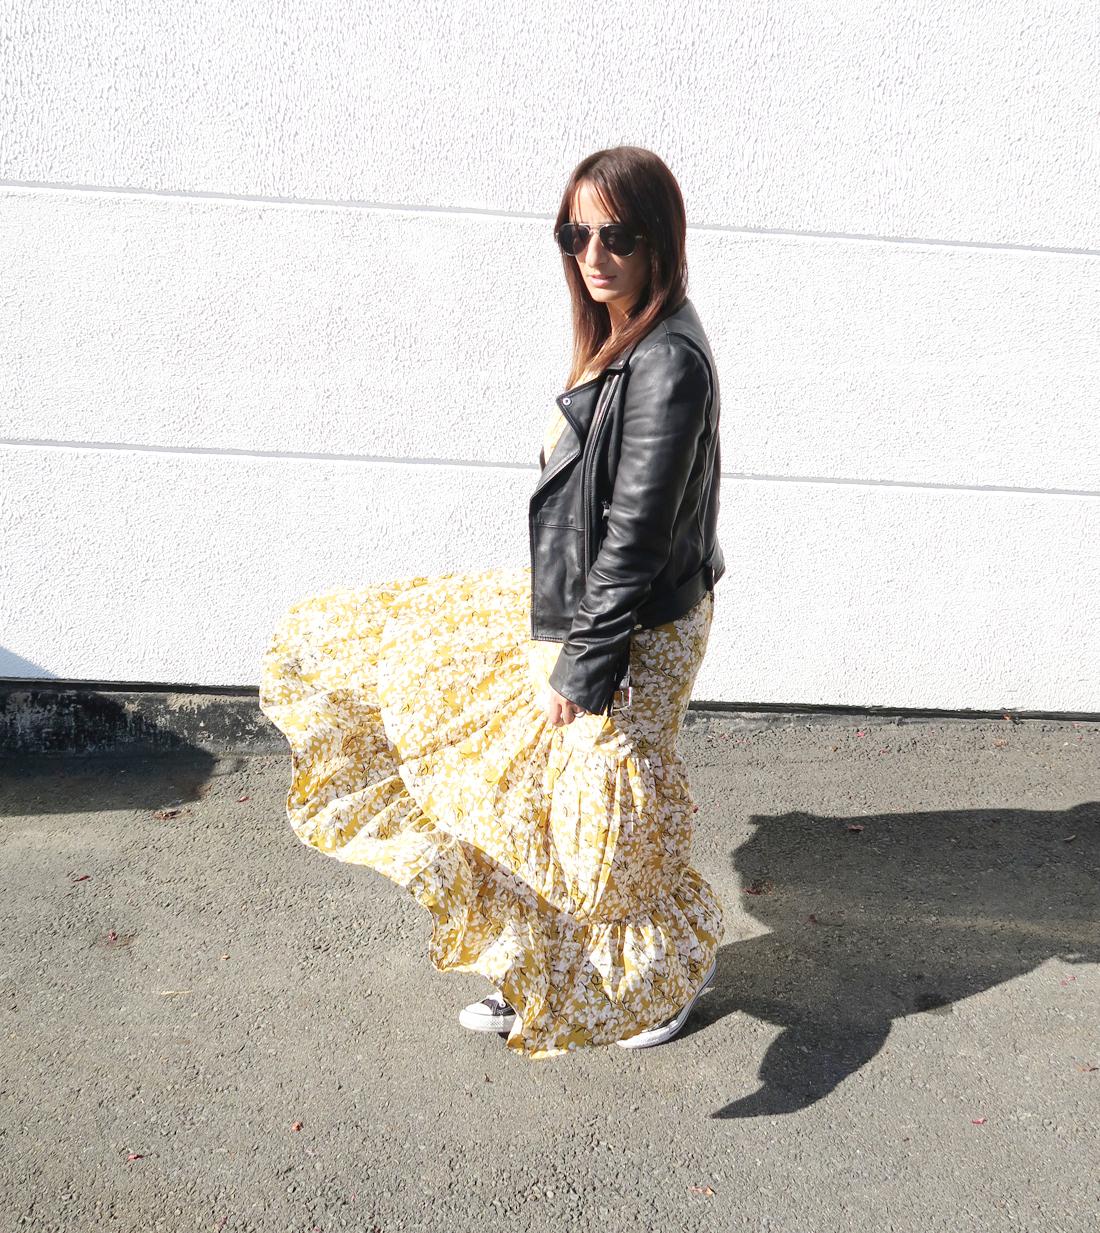 dressfo-kleid-modeblogger-fashionblogger-blogger-style-fashion-modesalat-streetstyle-11